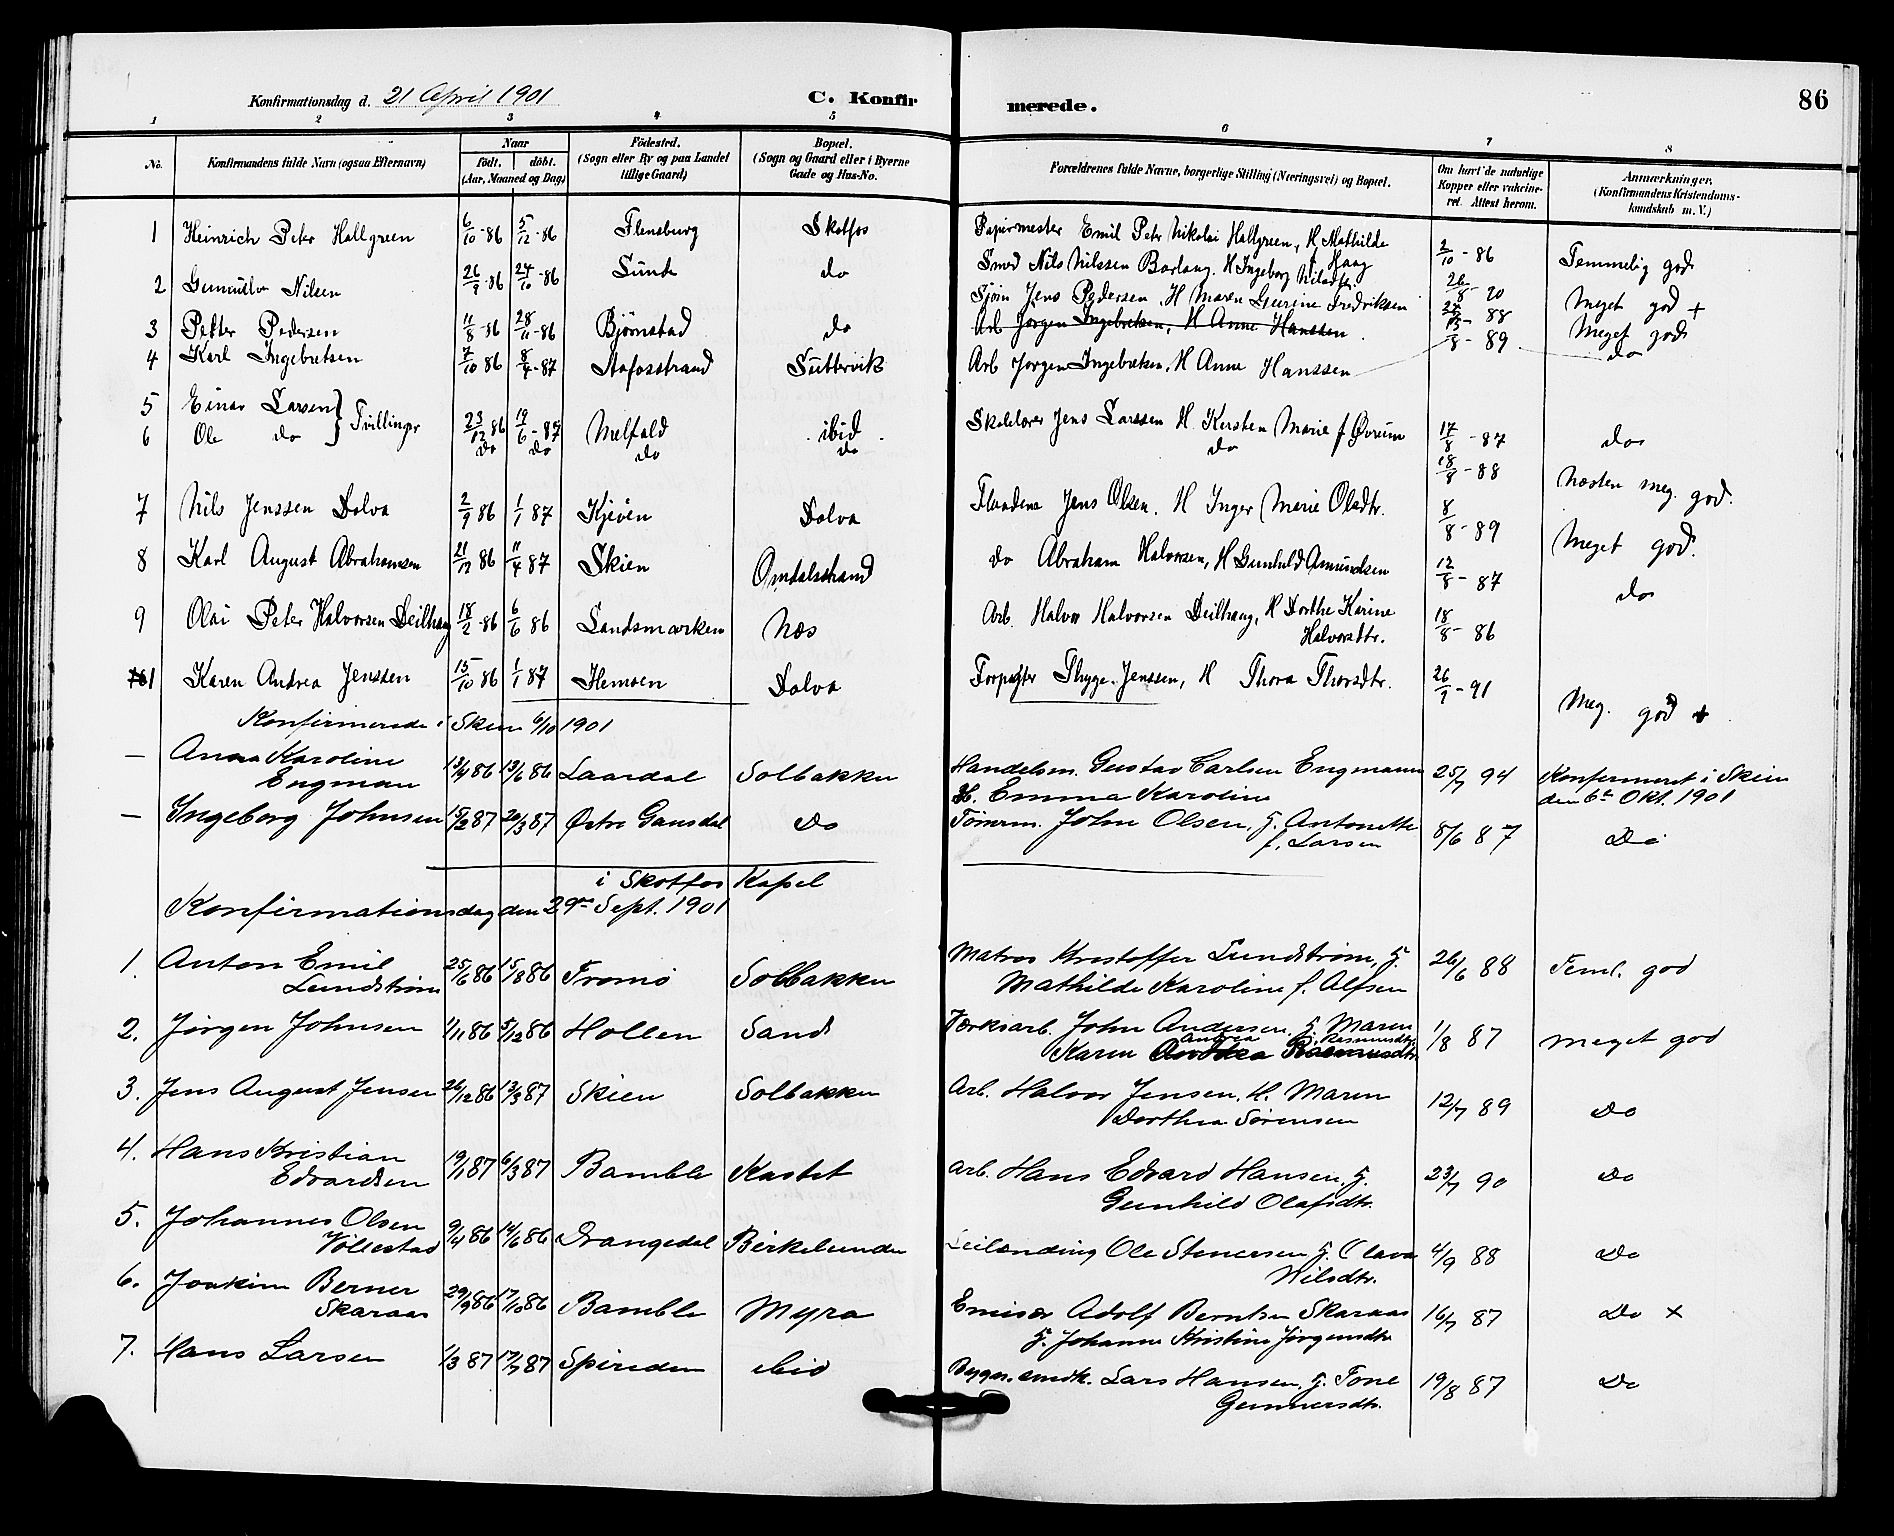 SAKO, Solum kirkebøker, G/Gb/L0004: Klokkerbok nr. II 4, 1898-1905, s. 86